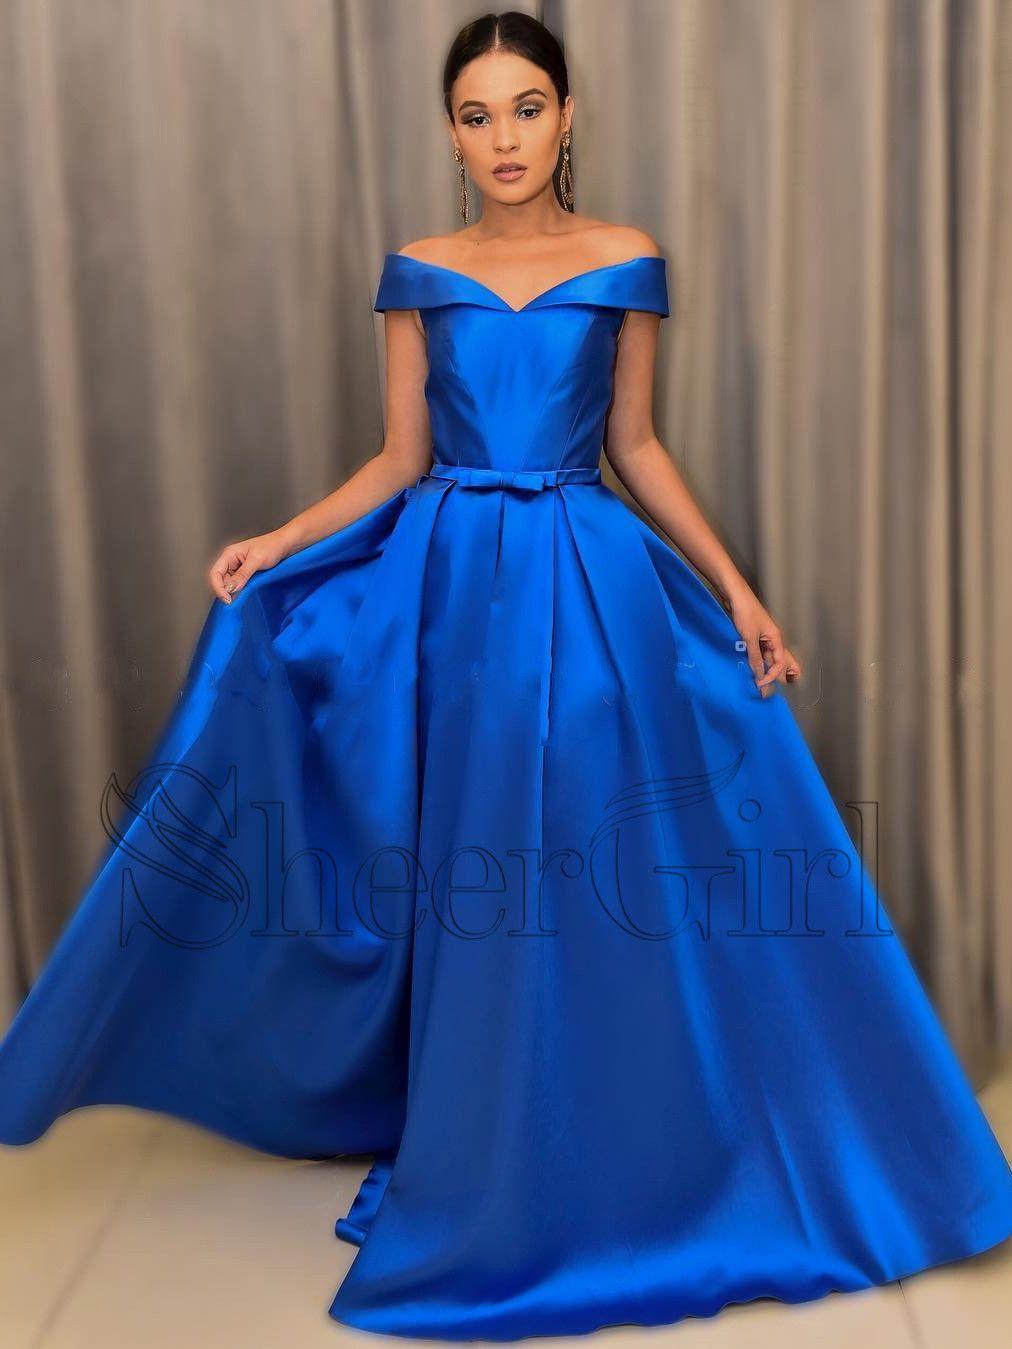 Off the shoulder royal blue prom dresses with belt long a line